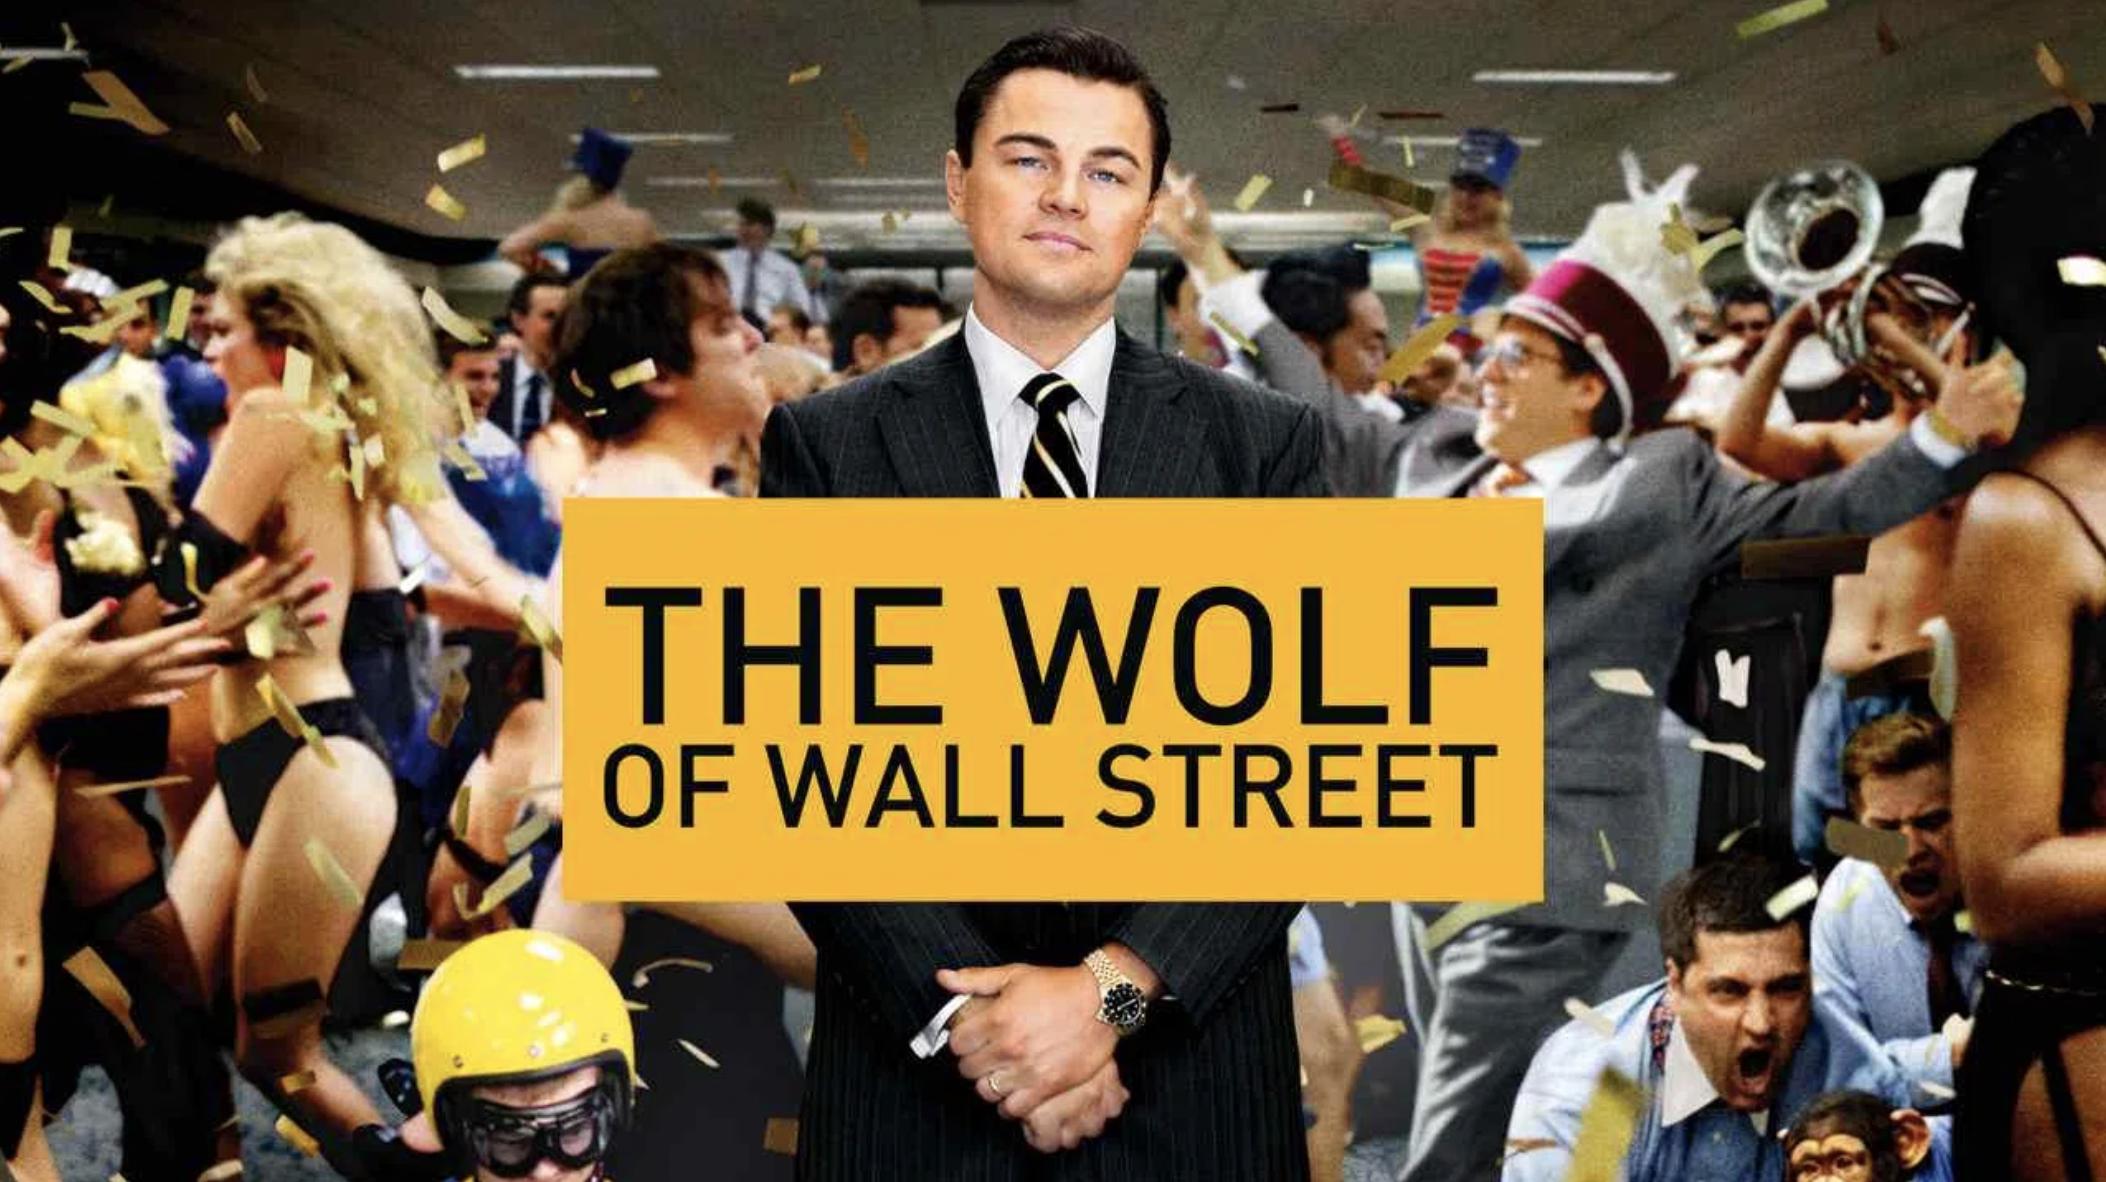 How to Watch The Wolf of Wall Street on Netflix - Best VPN Alternatives